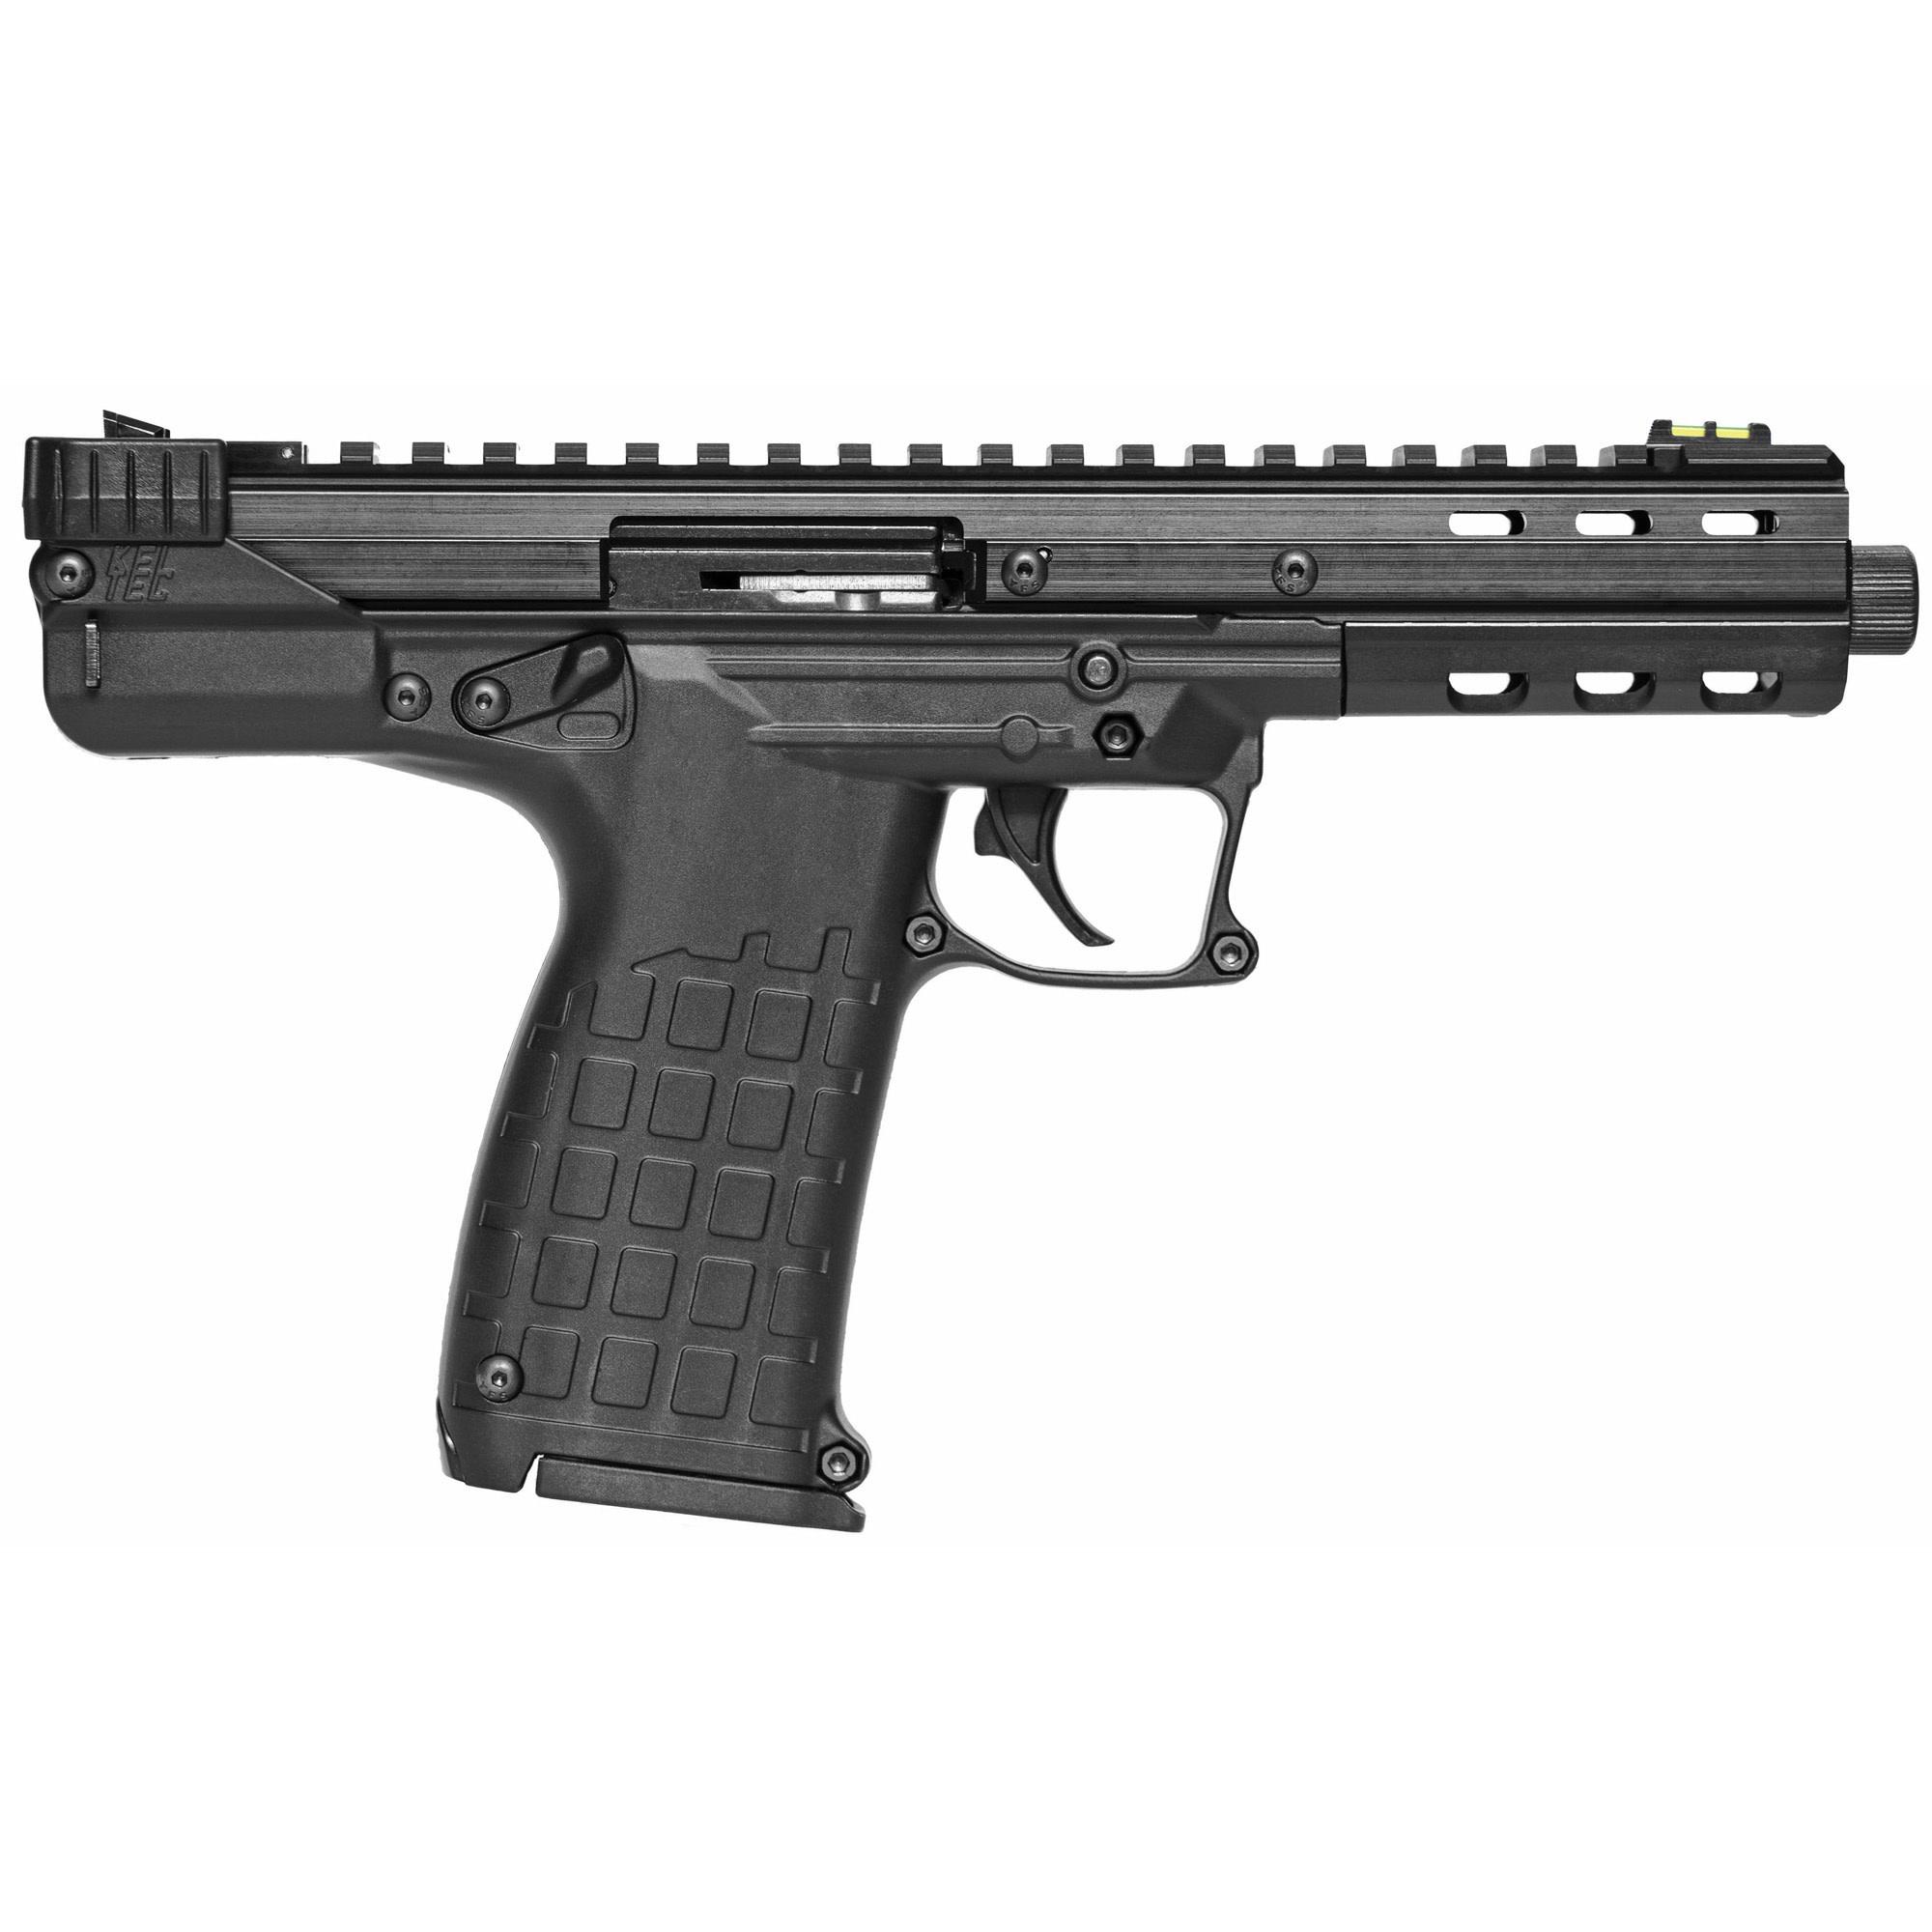 Kel-Tec CP33, 22 LR, 5.5'' Threaded Barrel, Polymer Frame, Adjustable Fiber Optic Sights, Black Finish, 33Rd, 2 Magazines